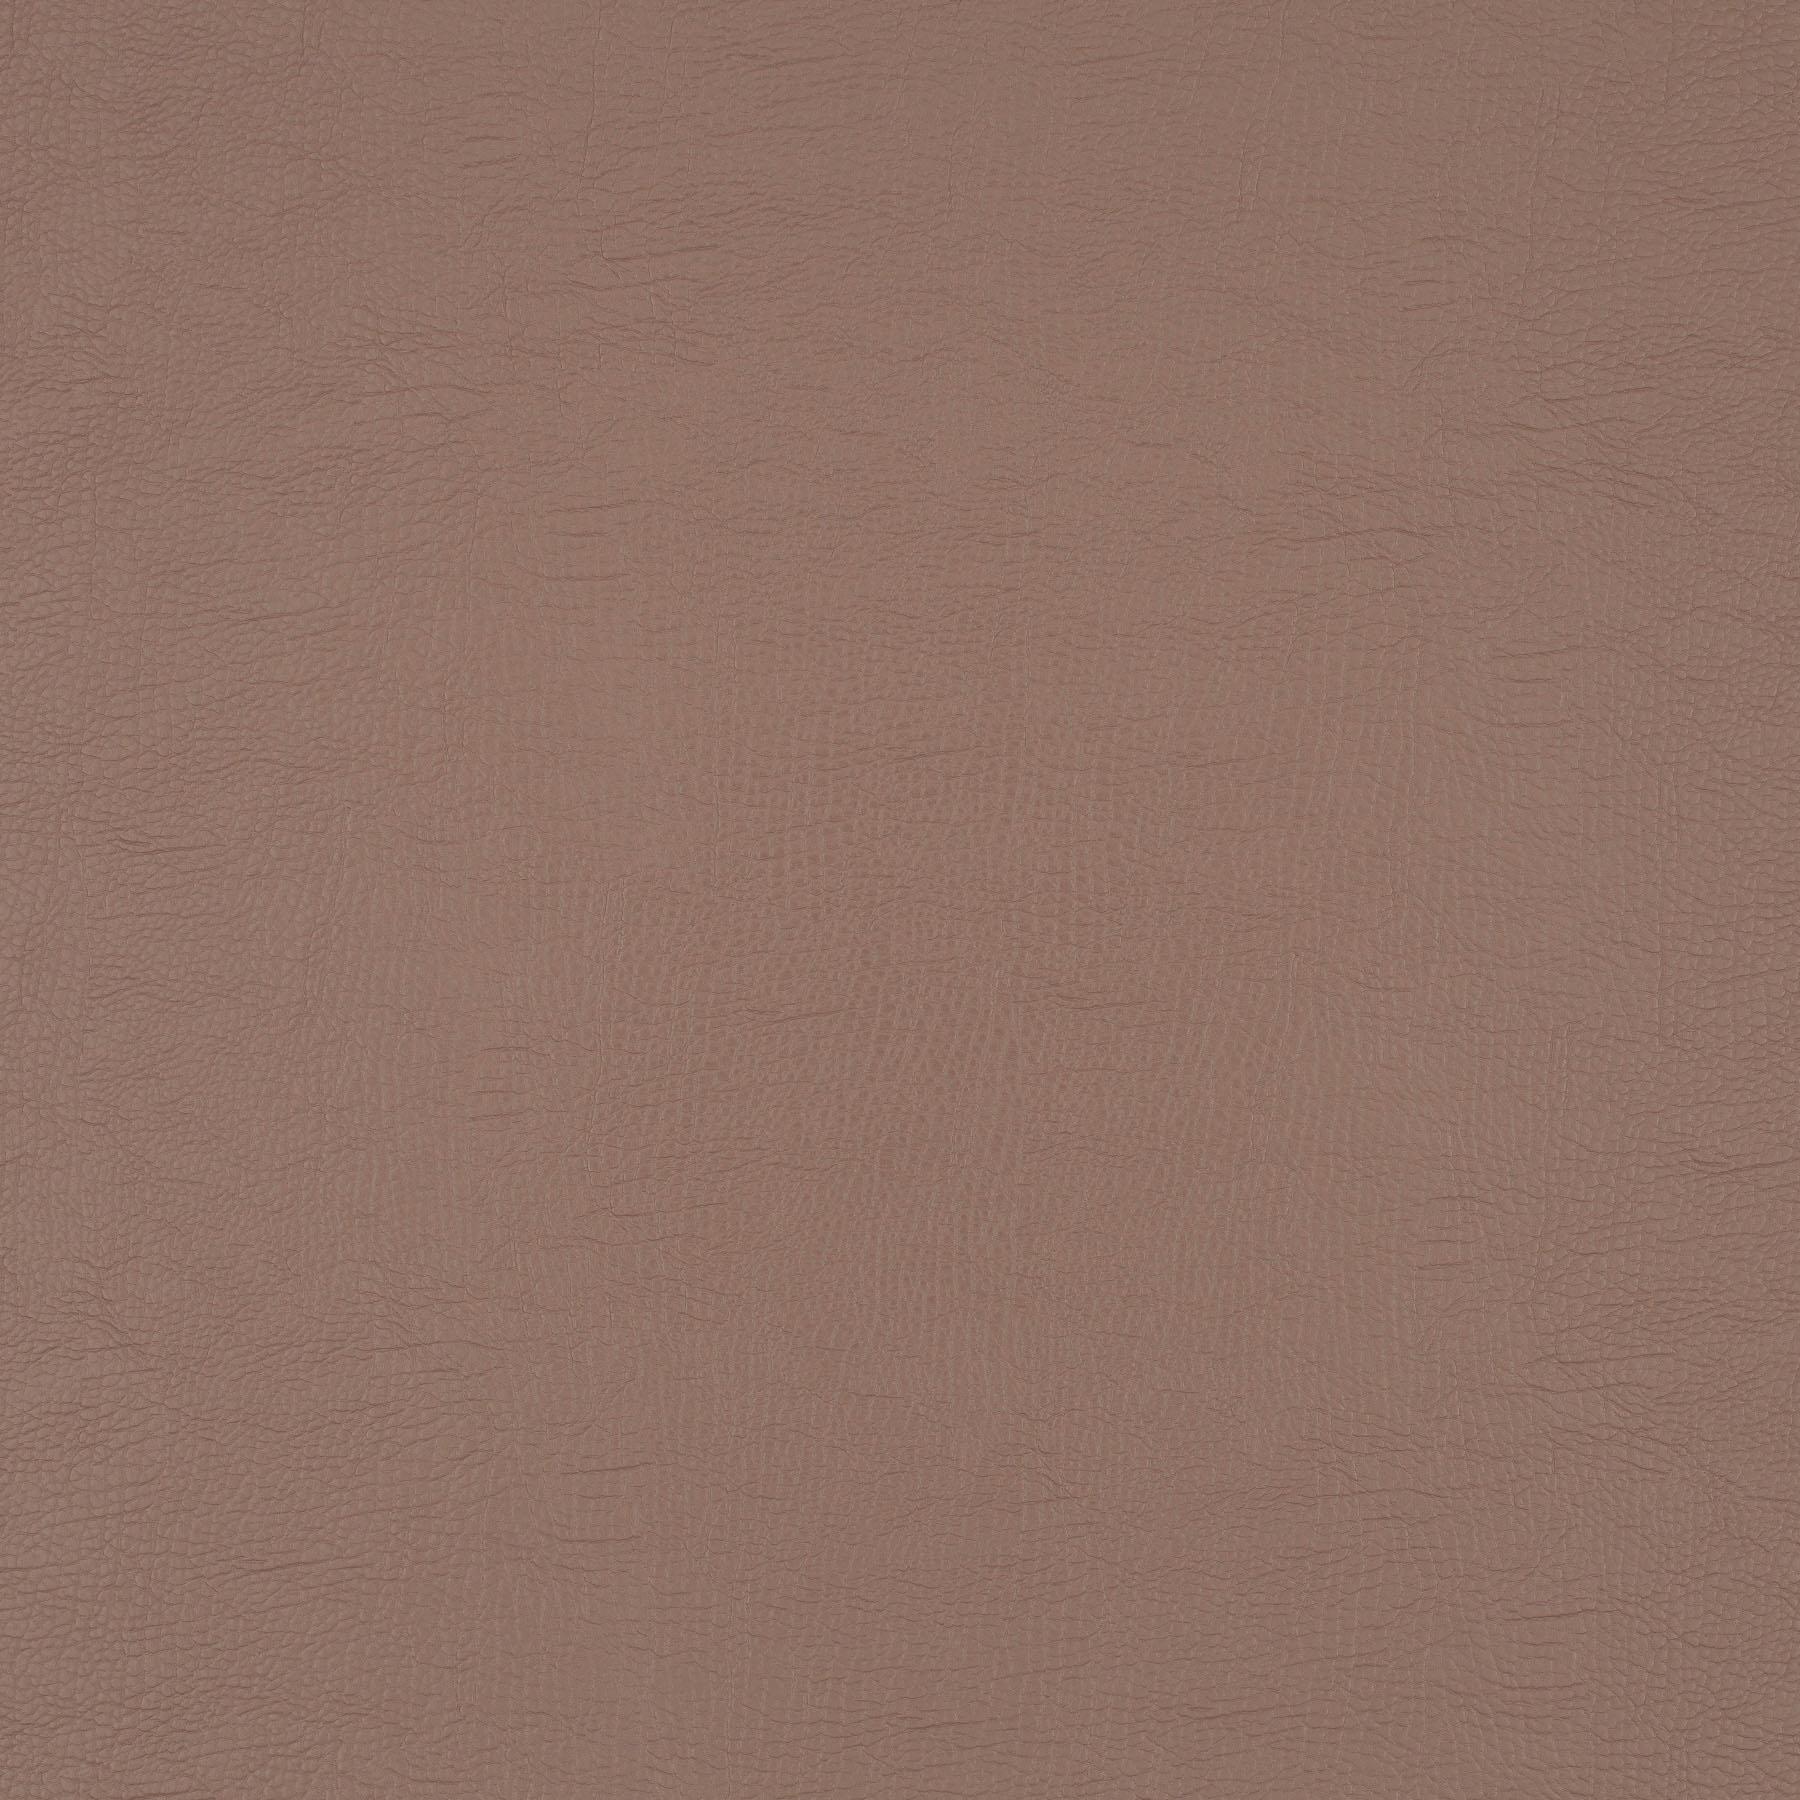 Upholstery Fabric Rocky 1 1280 027 Jab Anstoetz Fabrics